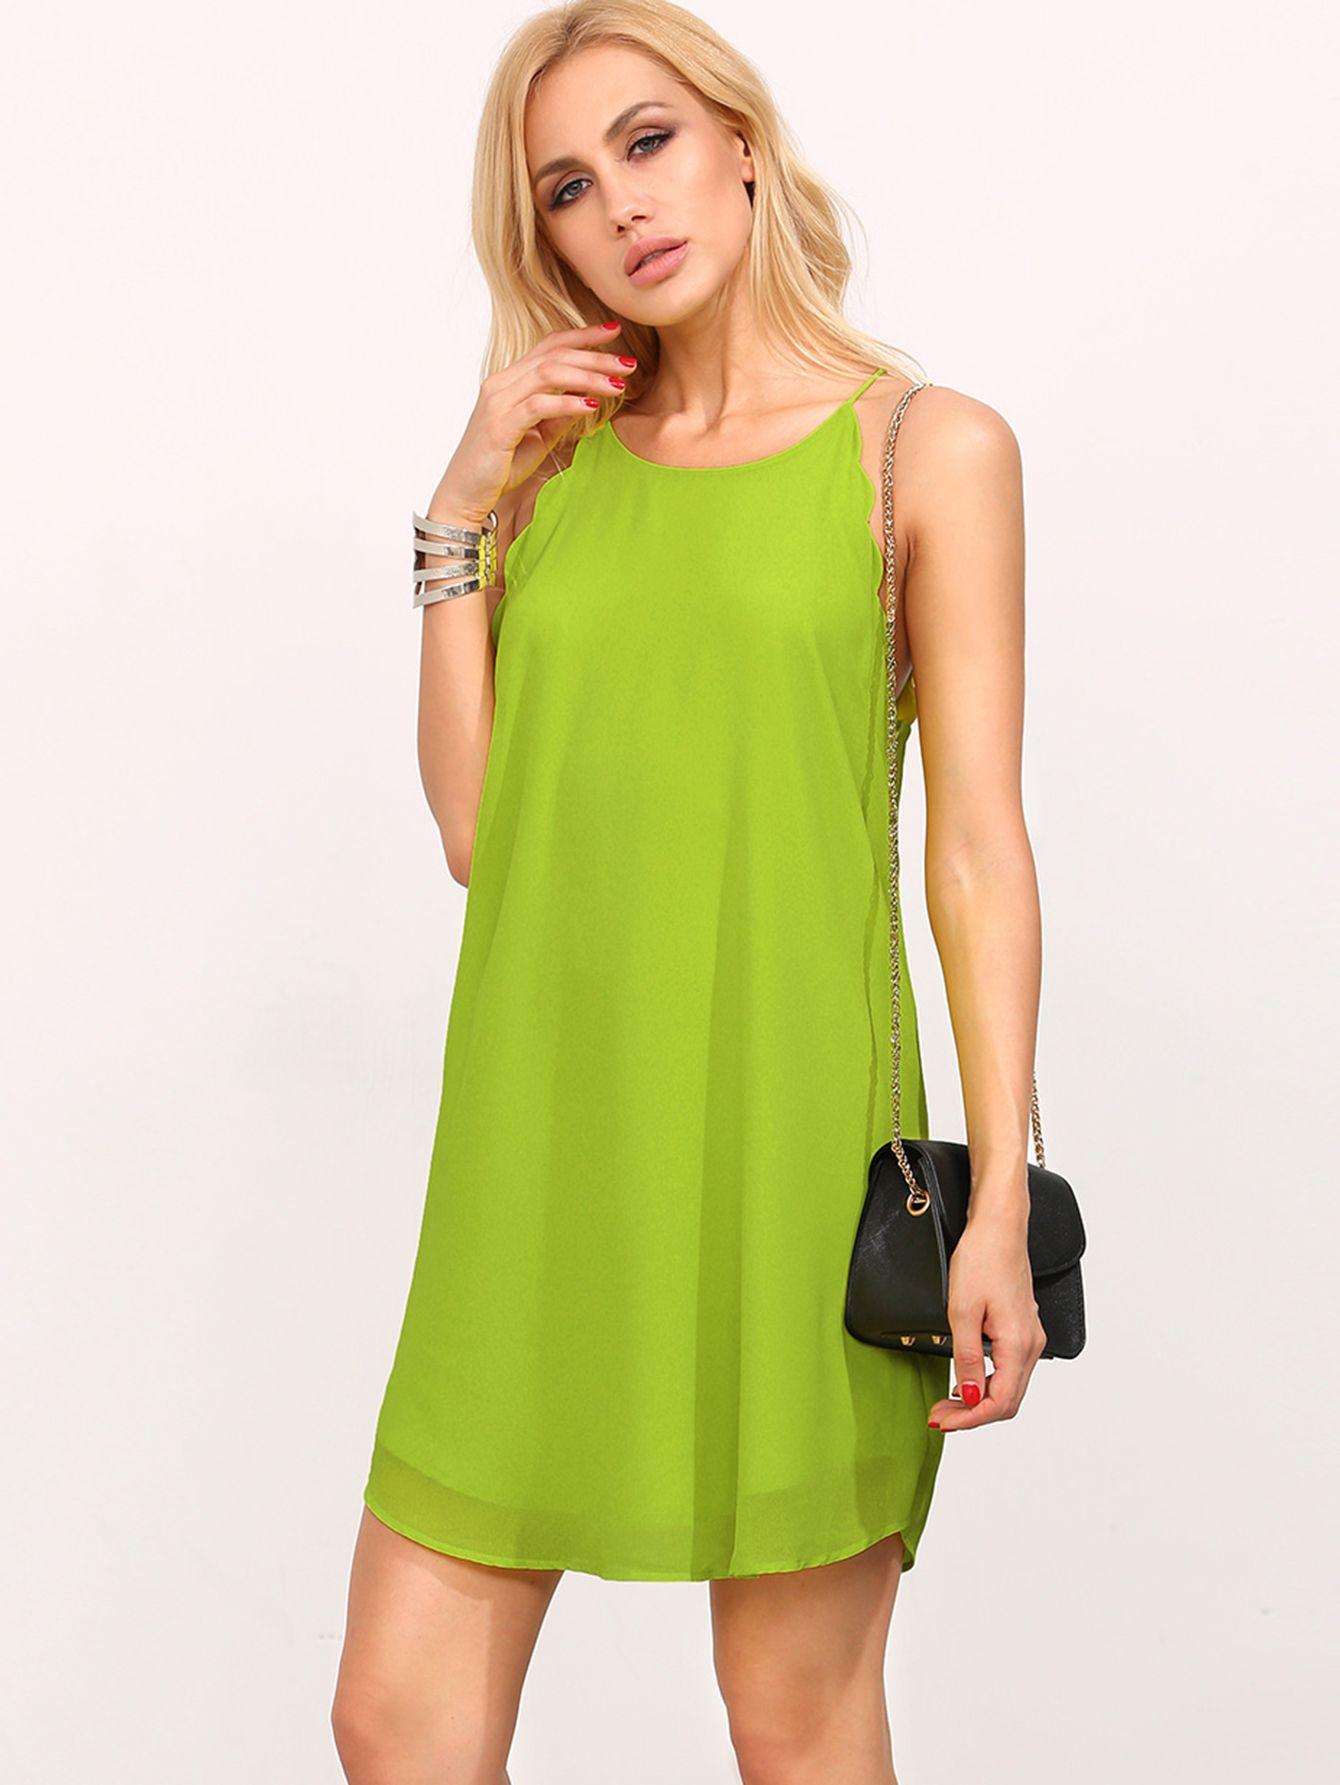 What to wear over a sleeveless dress to a wedding  Cómpralo ya Green Spaghetti Strap Scallop Frock Shift Dress Green